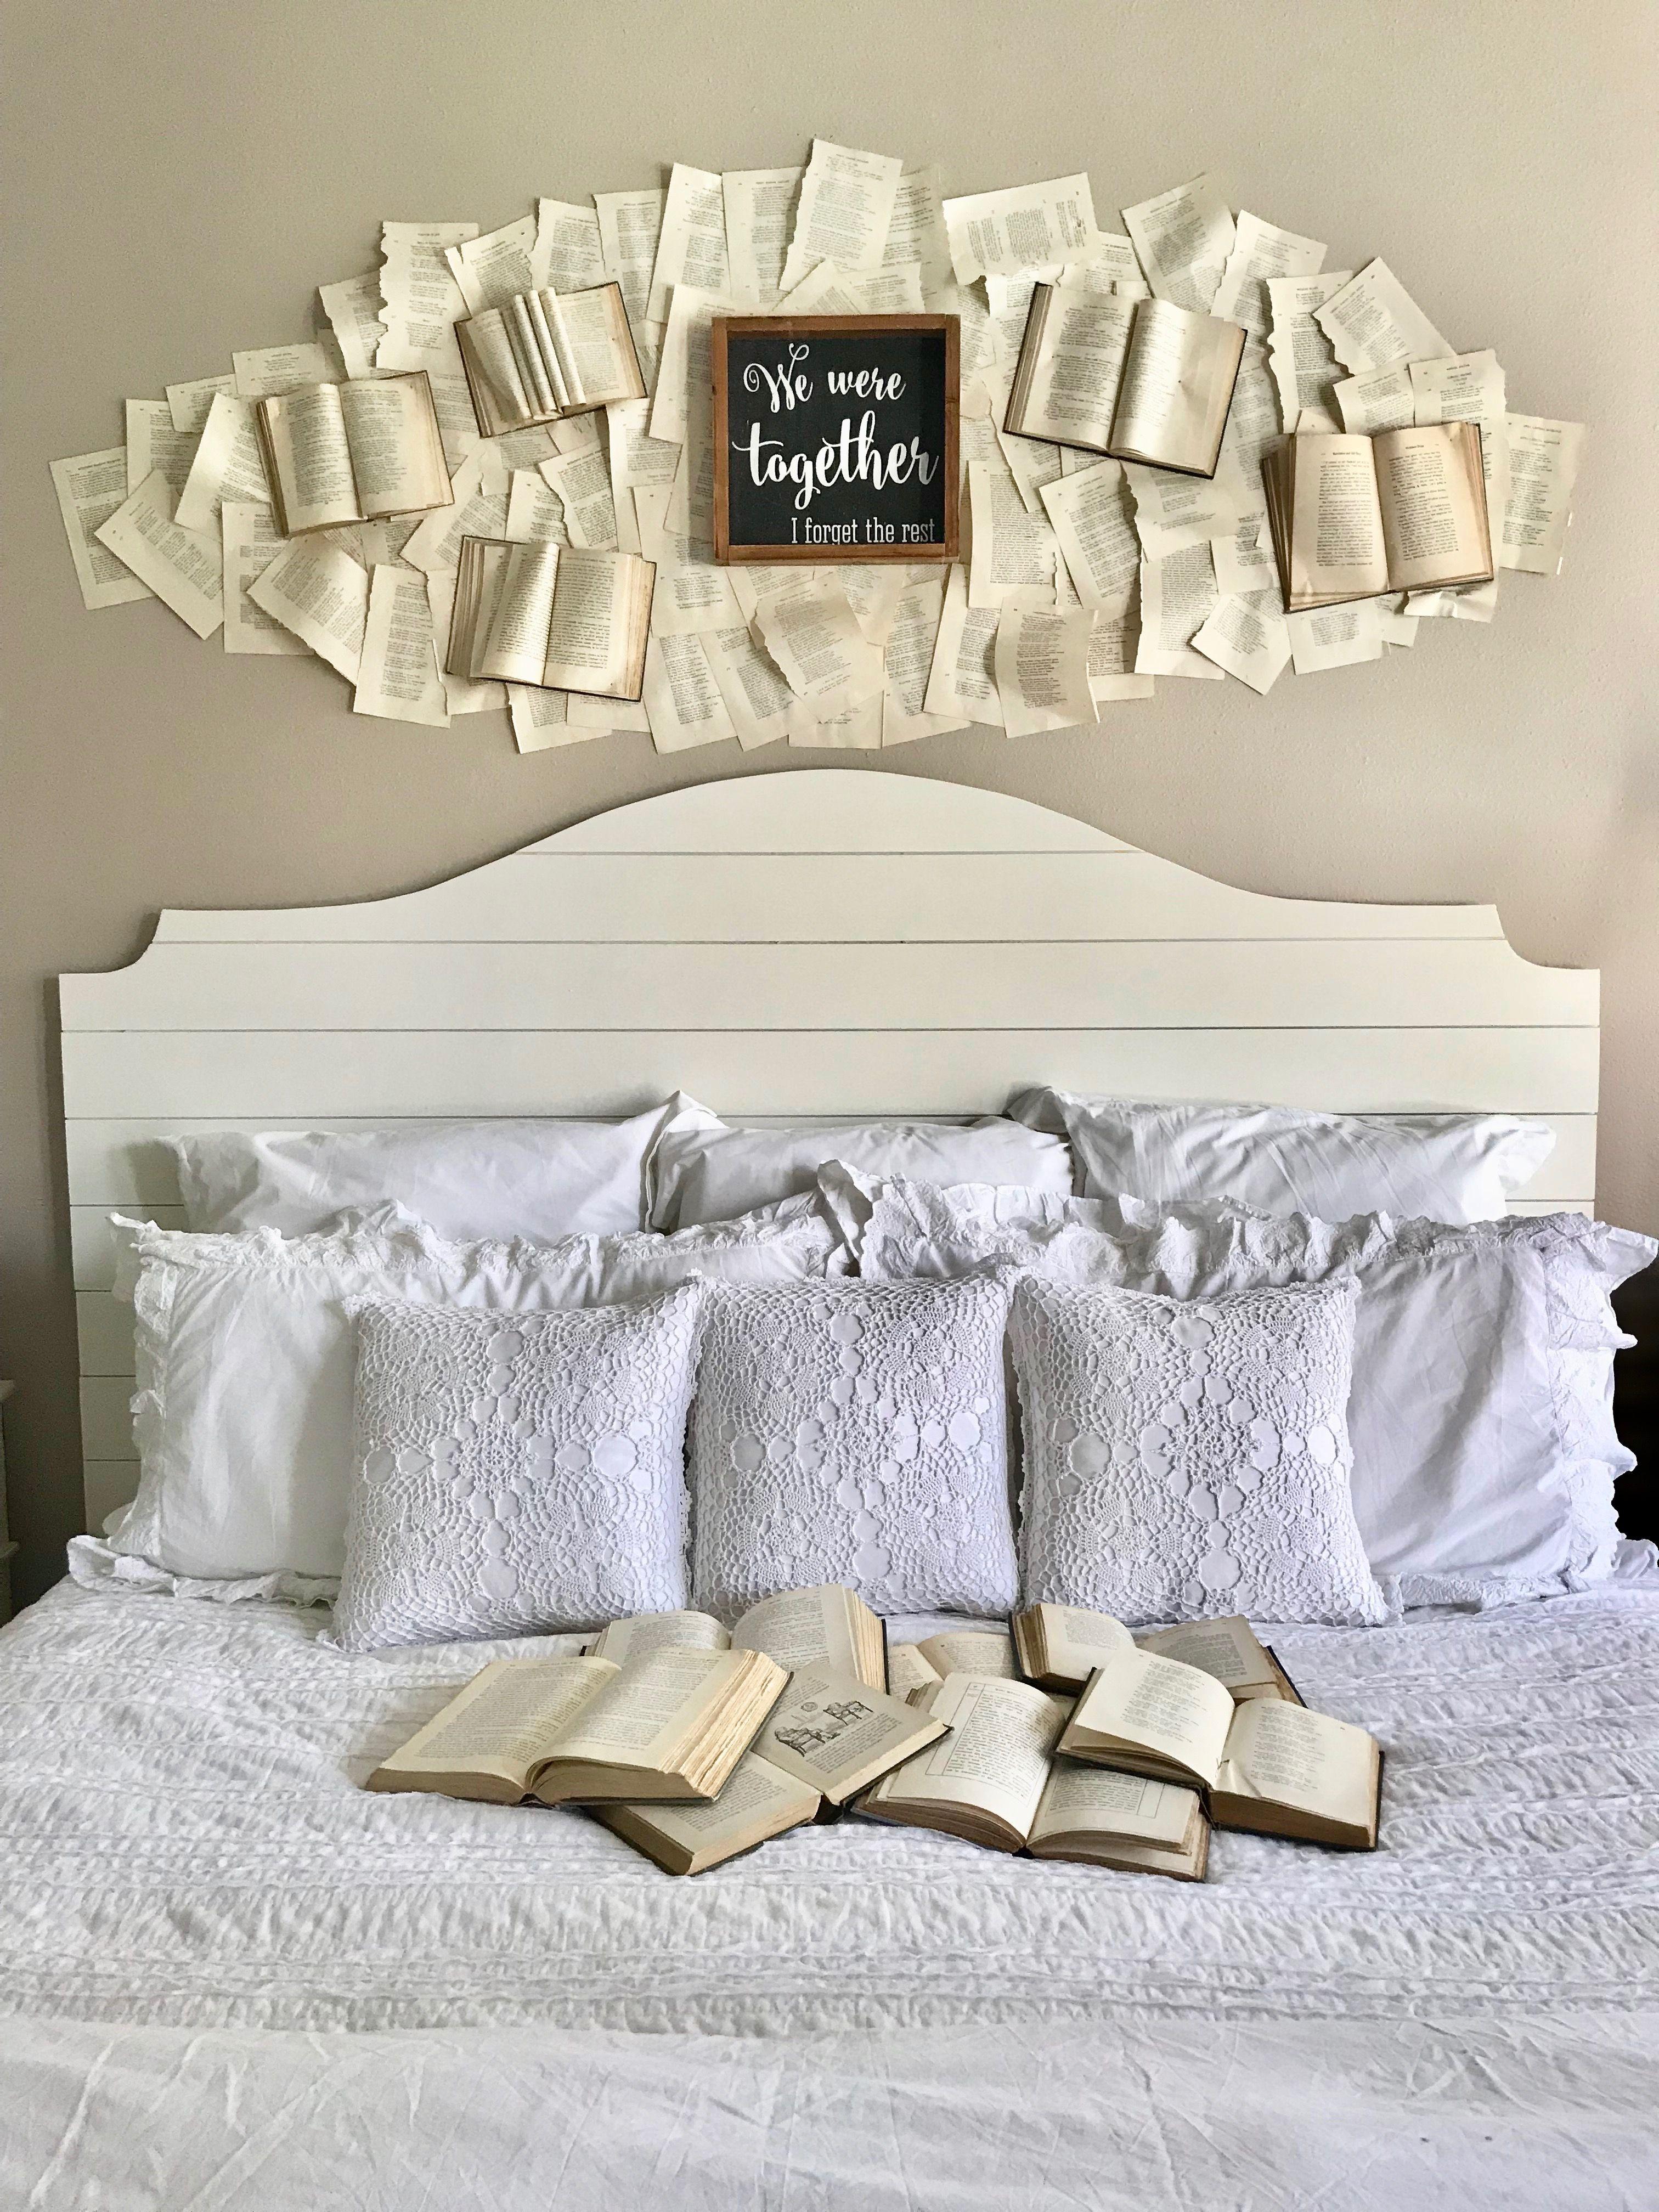 Book Wall Tutorial  Master bedroom diy, Creative bedroom, Book wall